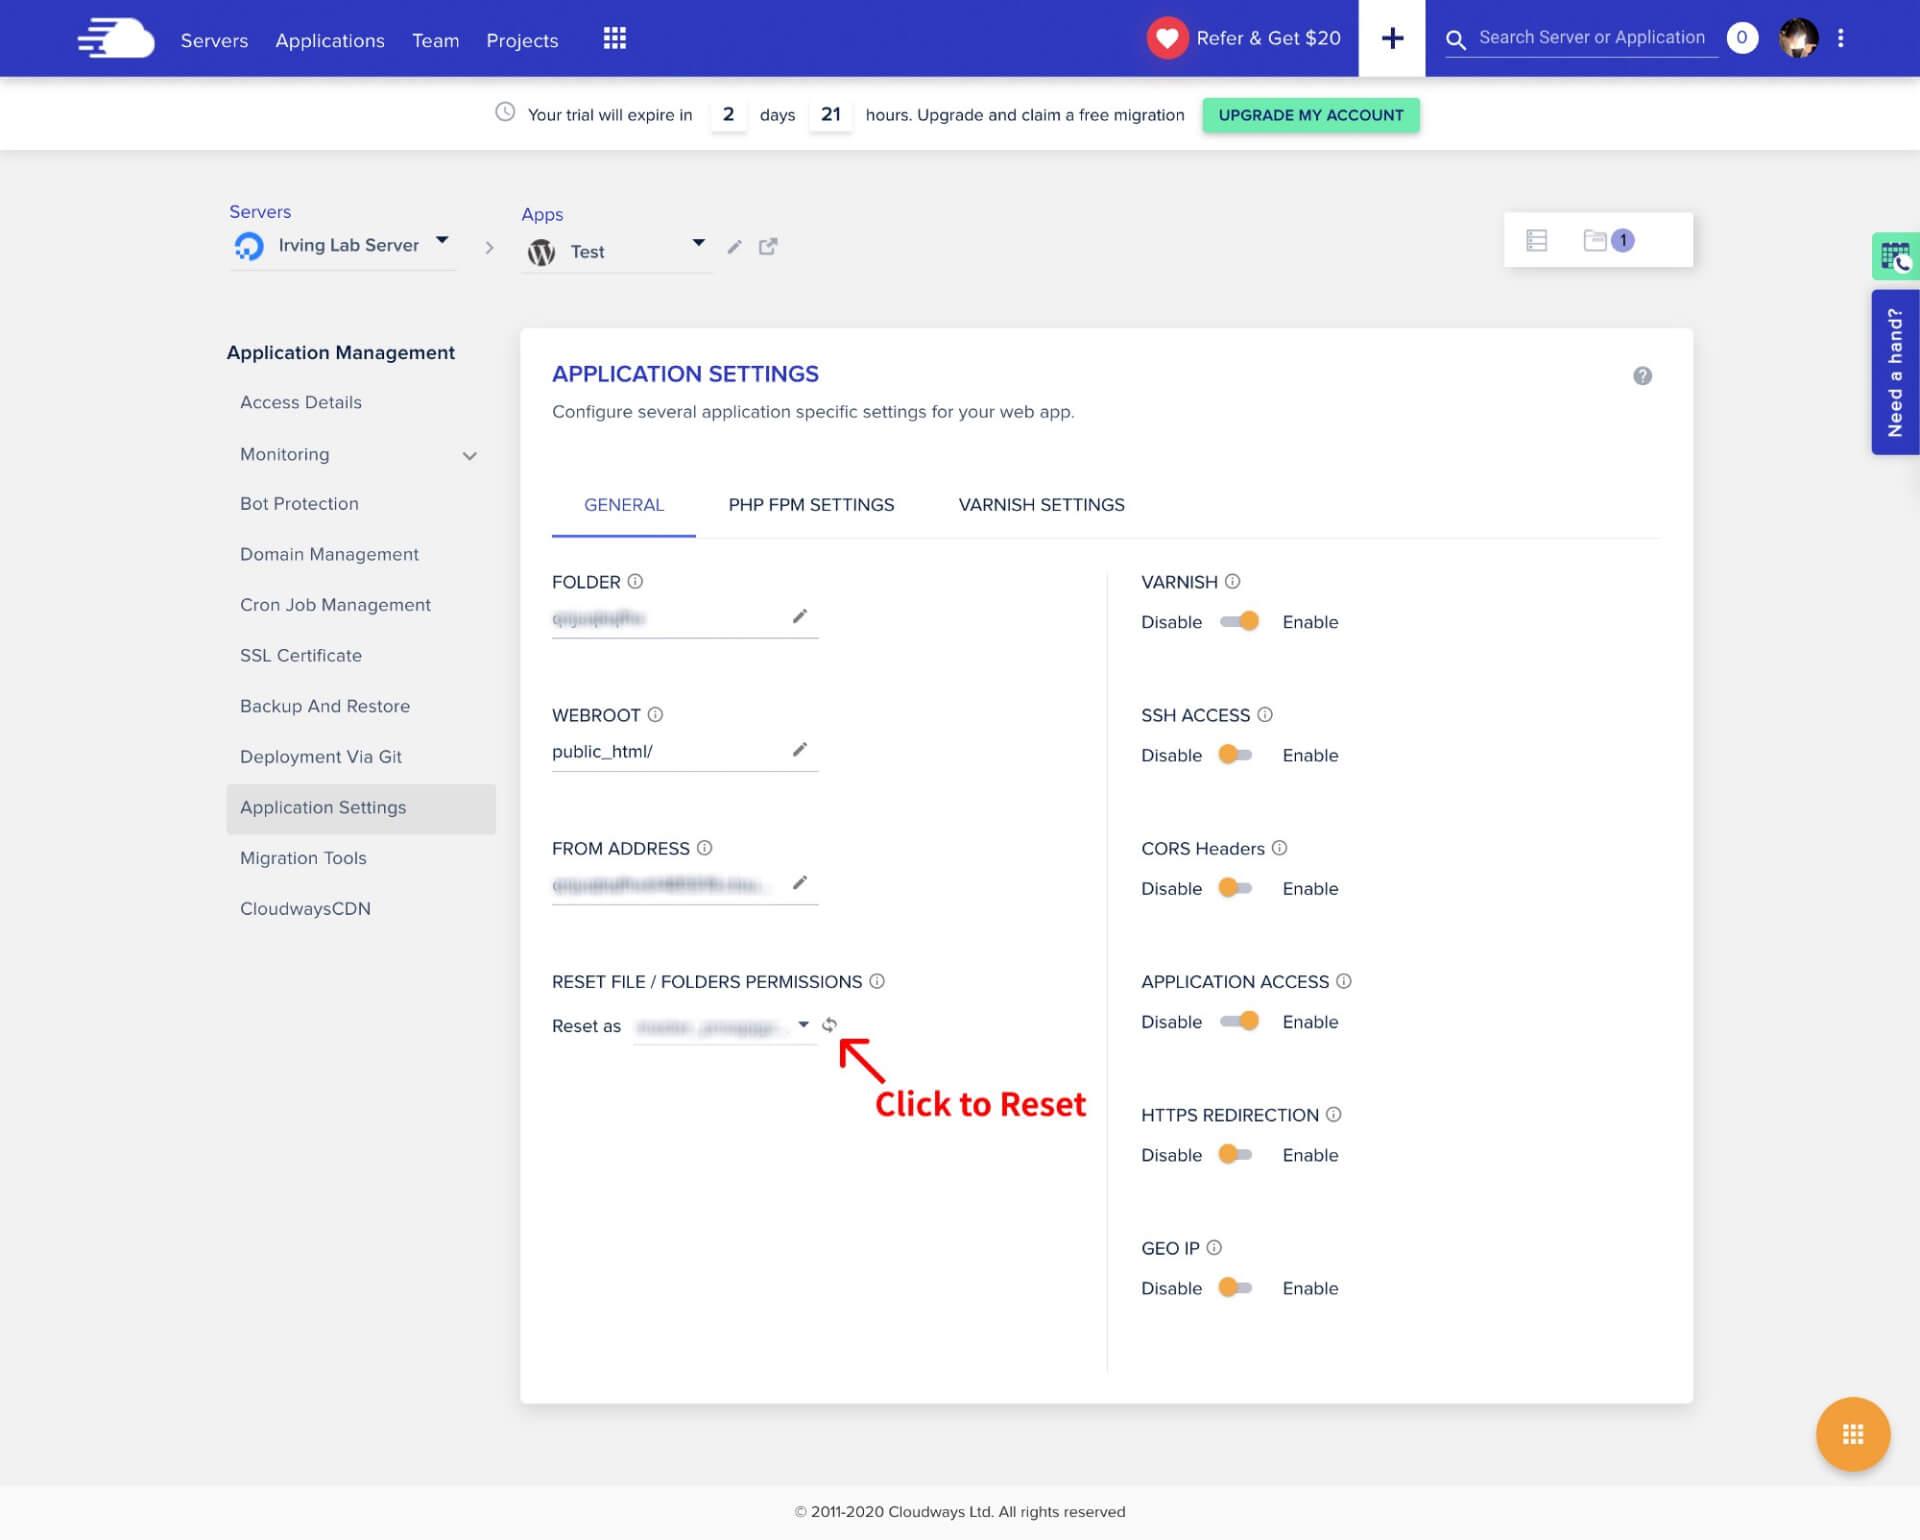 初次建立網站後,Cloudways 要 Reset File and Folder Permissions of an Application 才能進行透過 FileZilla 上傳檔案-IrvingLab 爾文實驗室